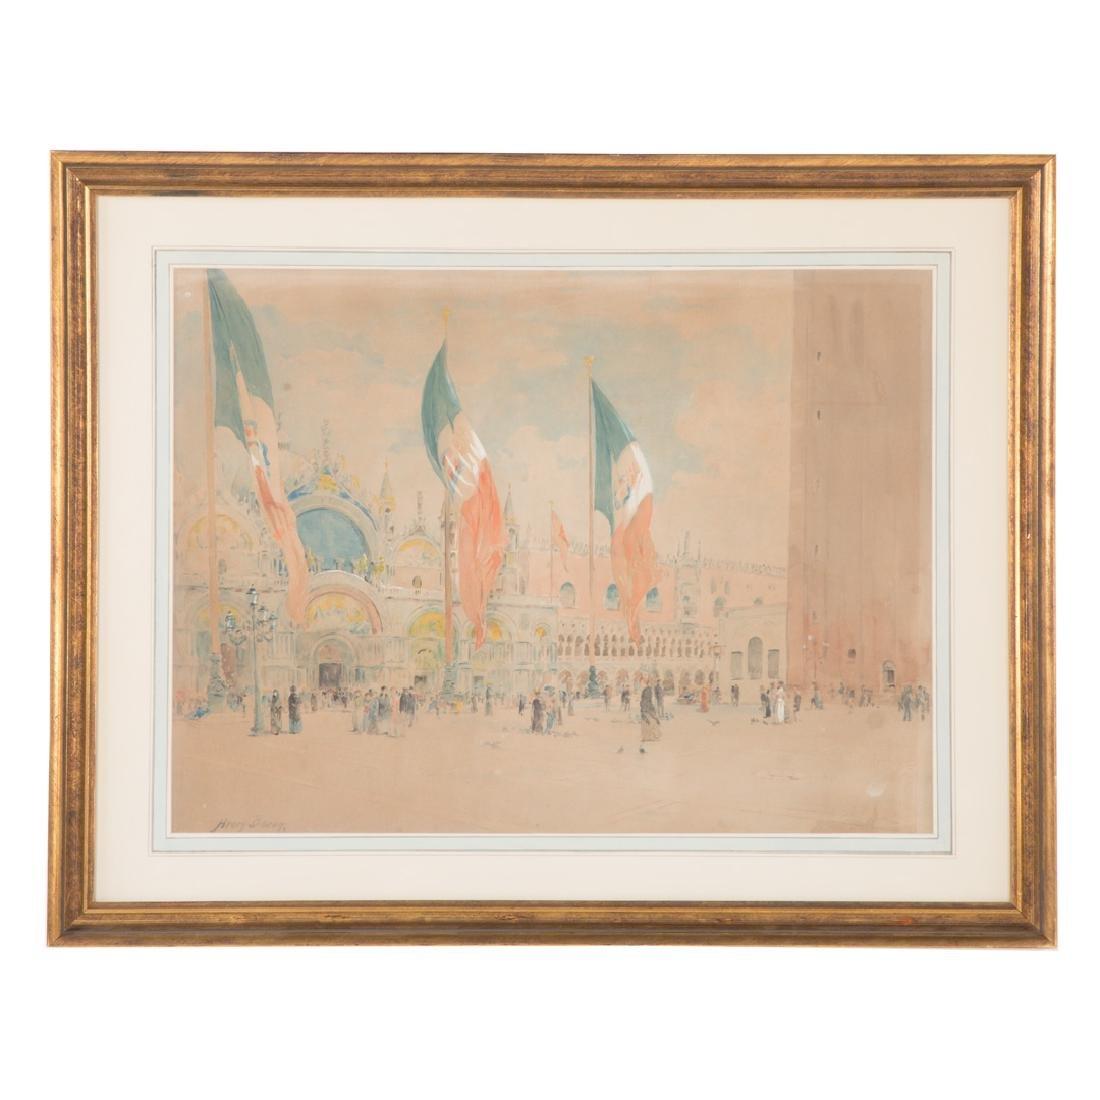 Henry Bacon. Piazza San Marco, Venice, watercolor